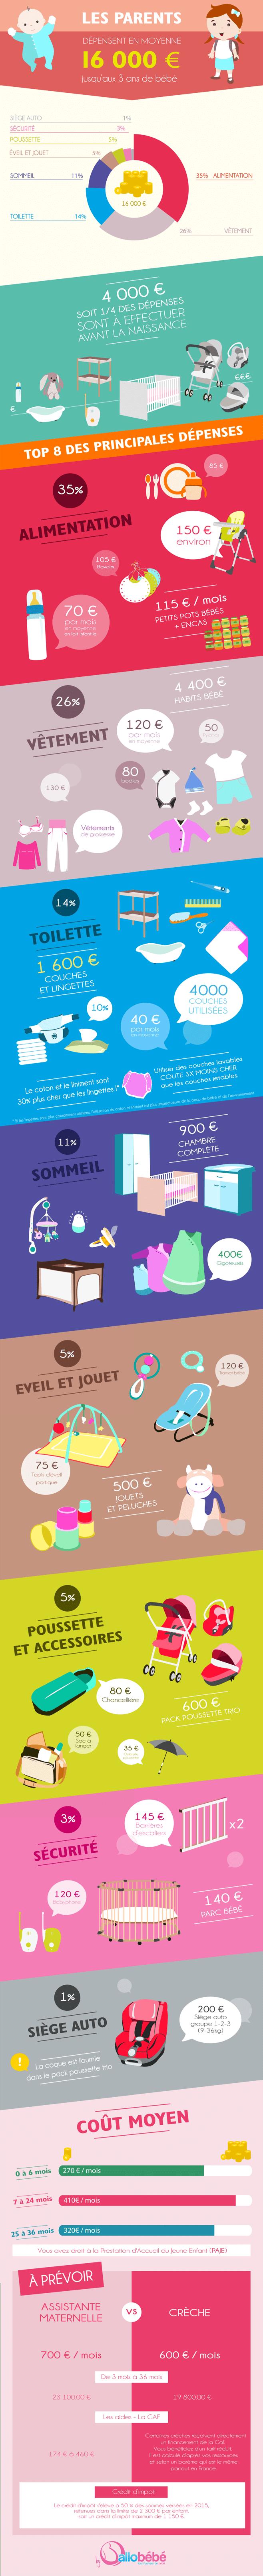 Cout d une with cout d une for Cout d une piscine couverte